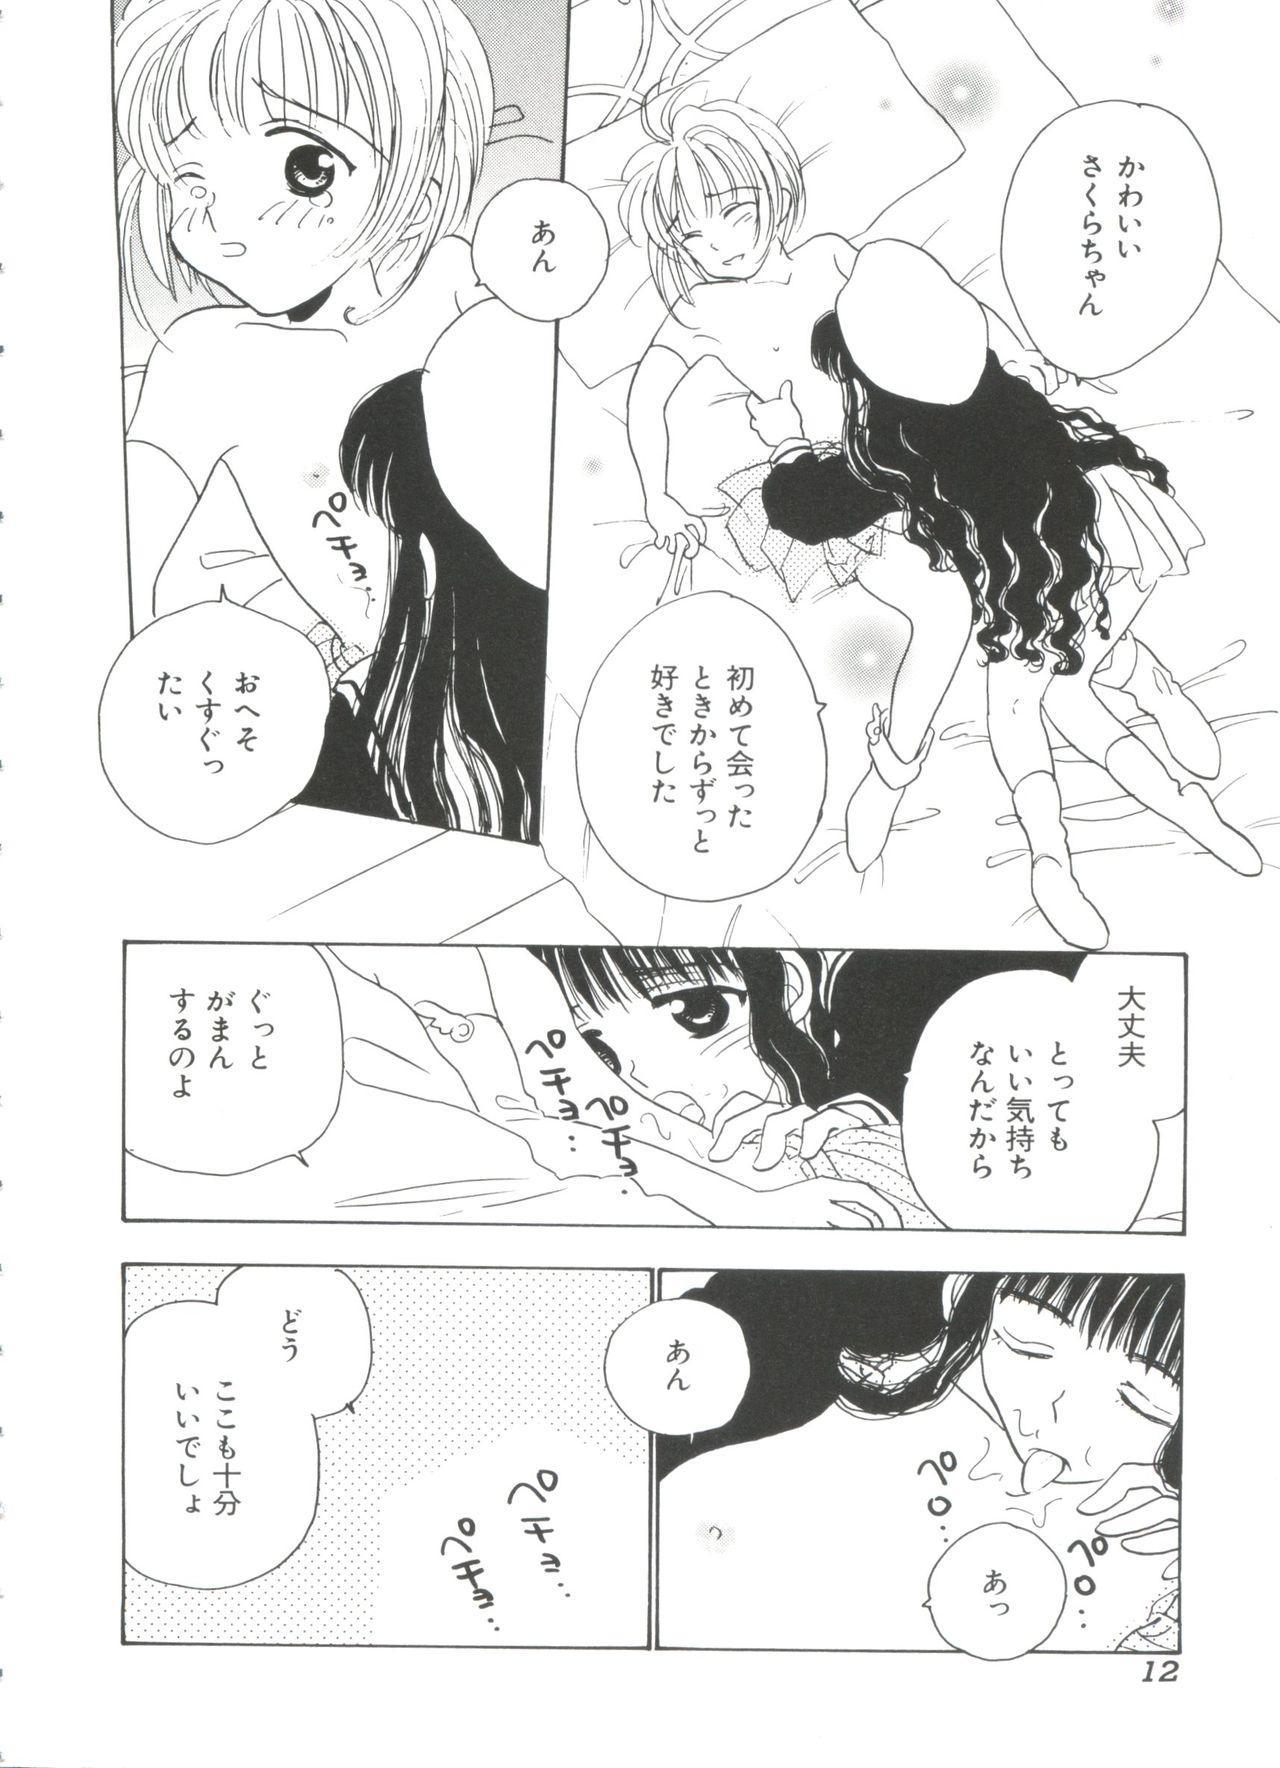 Ero-chan to Issho 13